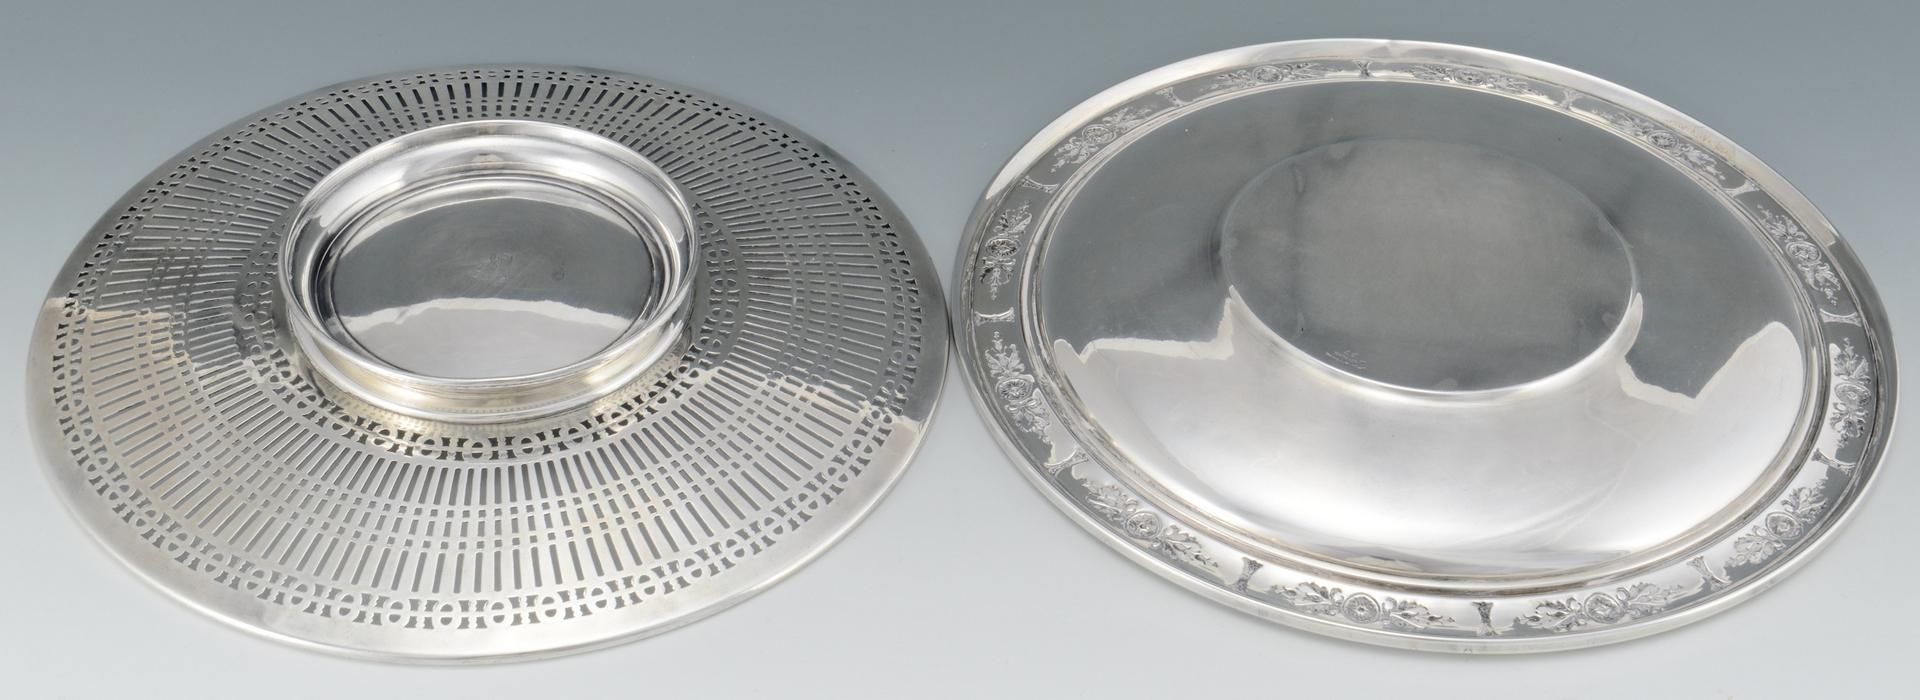 Lot 3088206: 3 pcs Sterling Hollowware: Veg. bowl, 2 plates